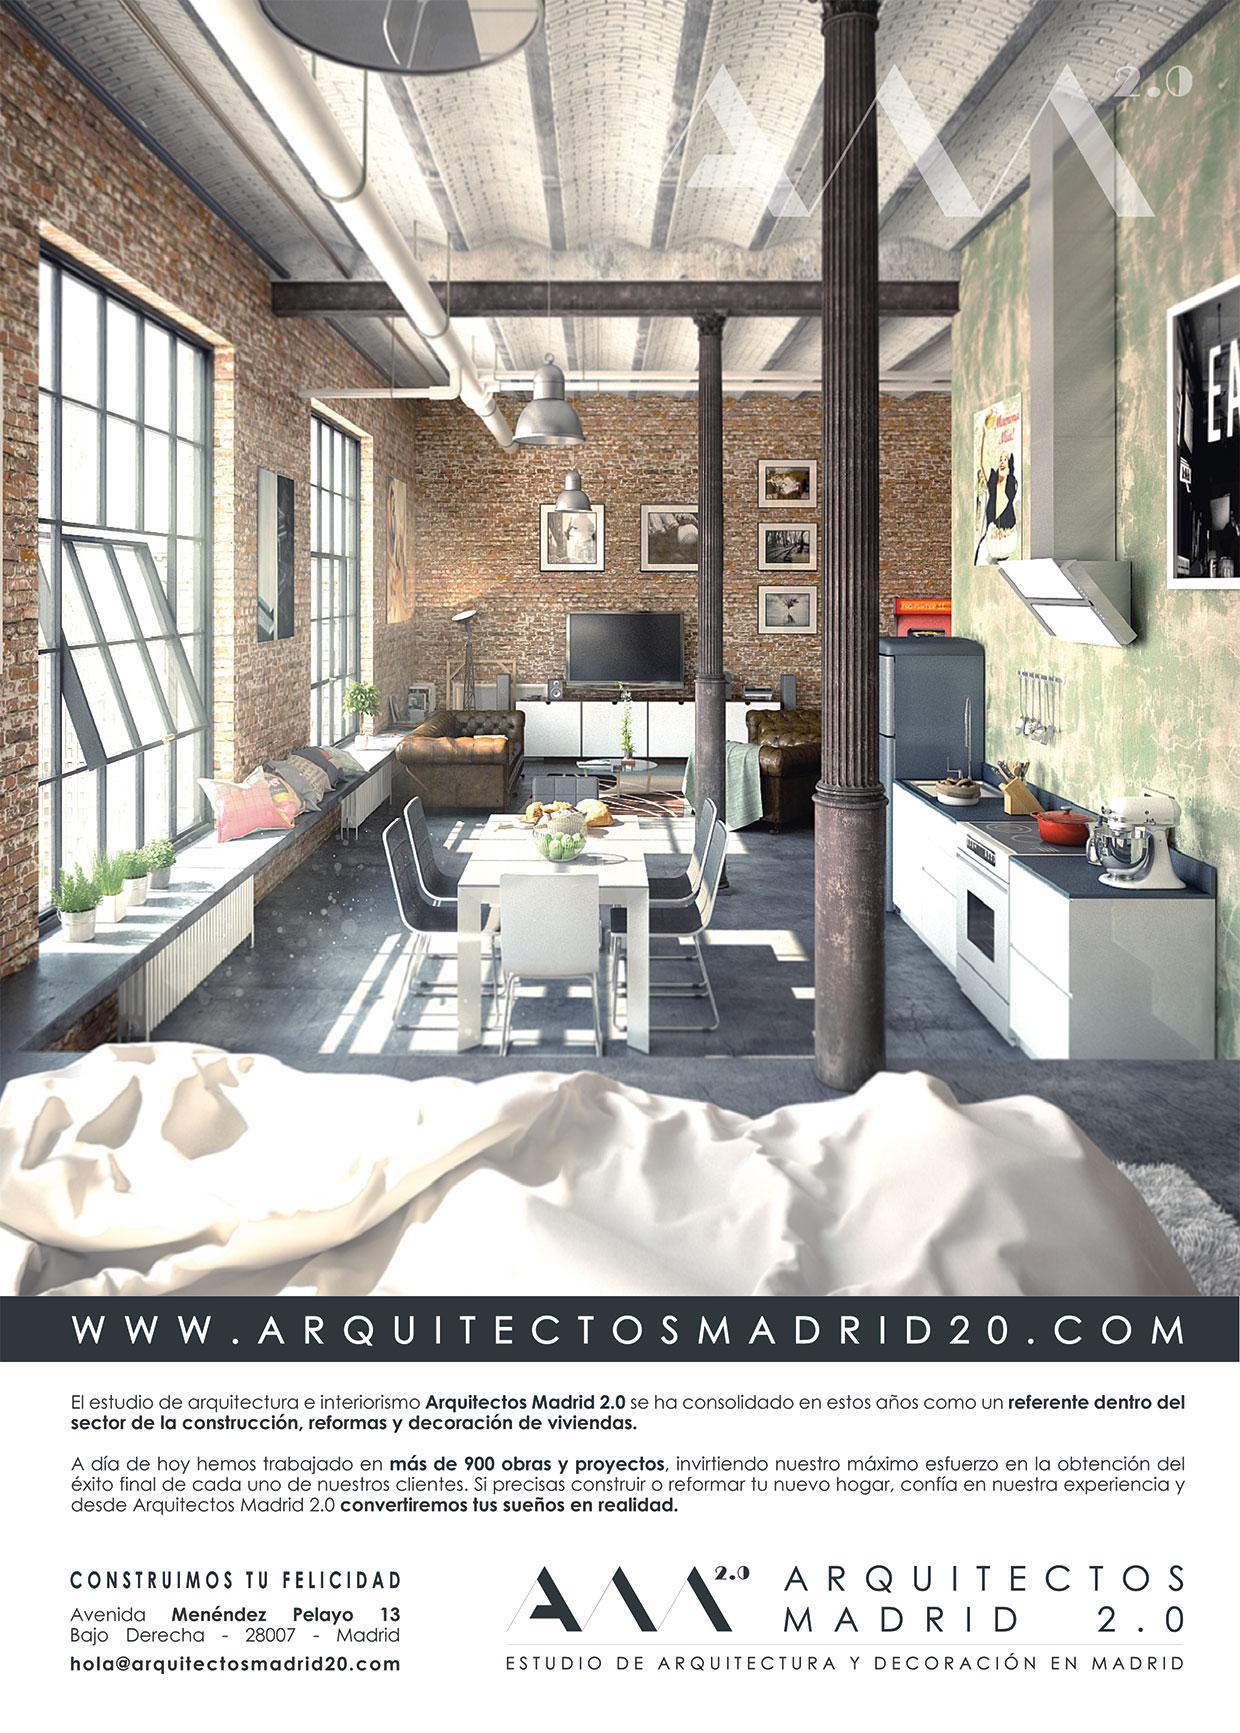 reformas-integrales-viviendas-unifamiliares-chalets-arquitectos-madrid